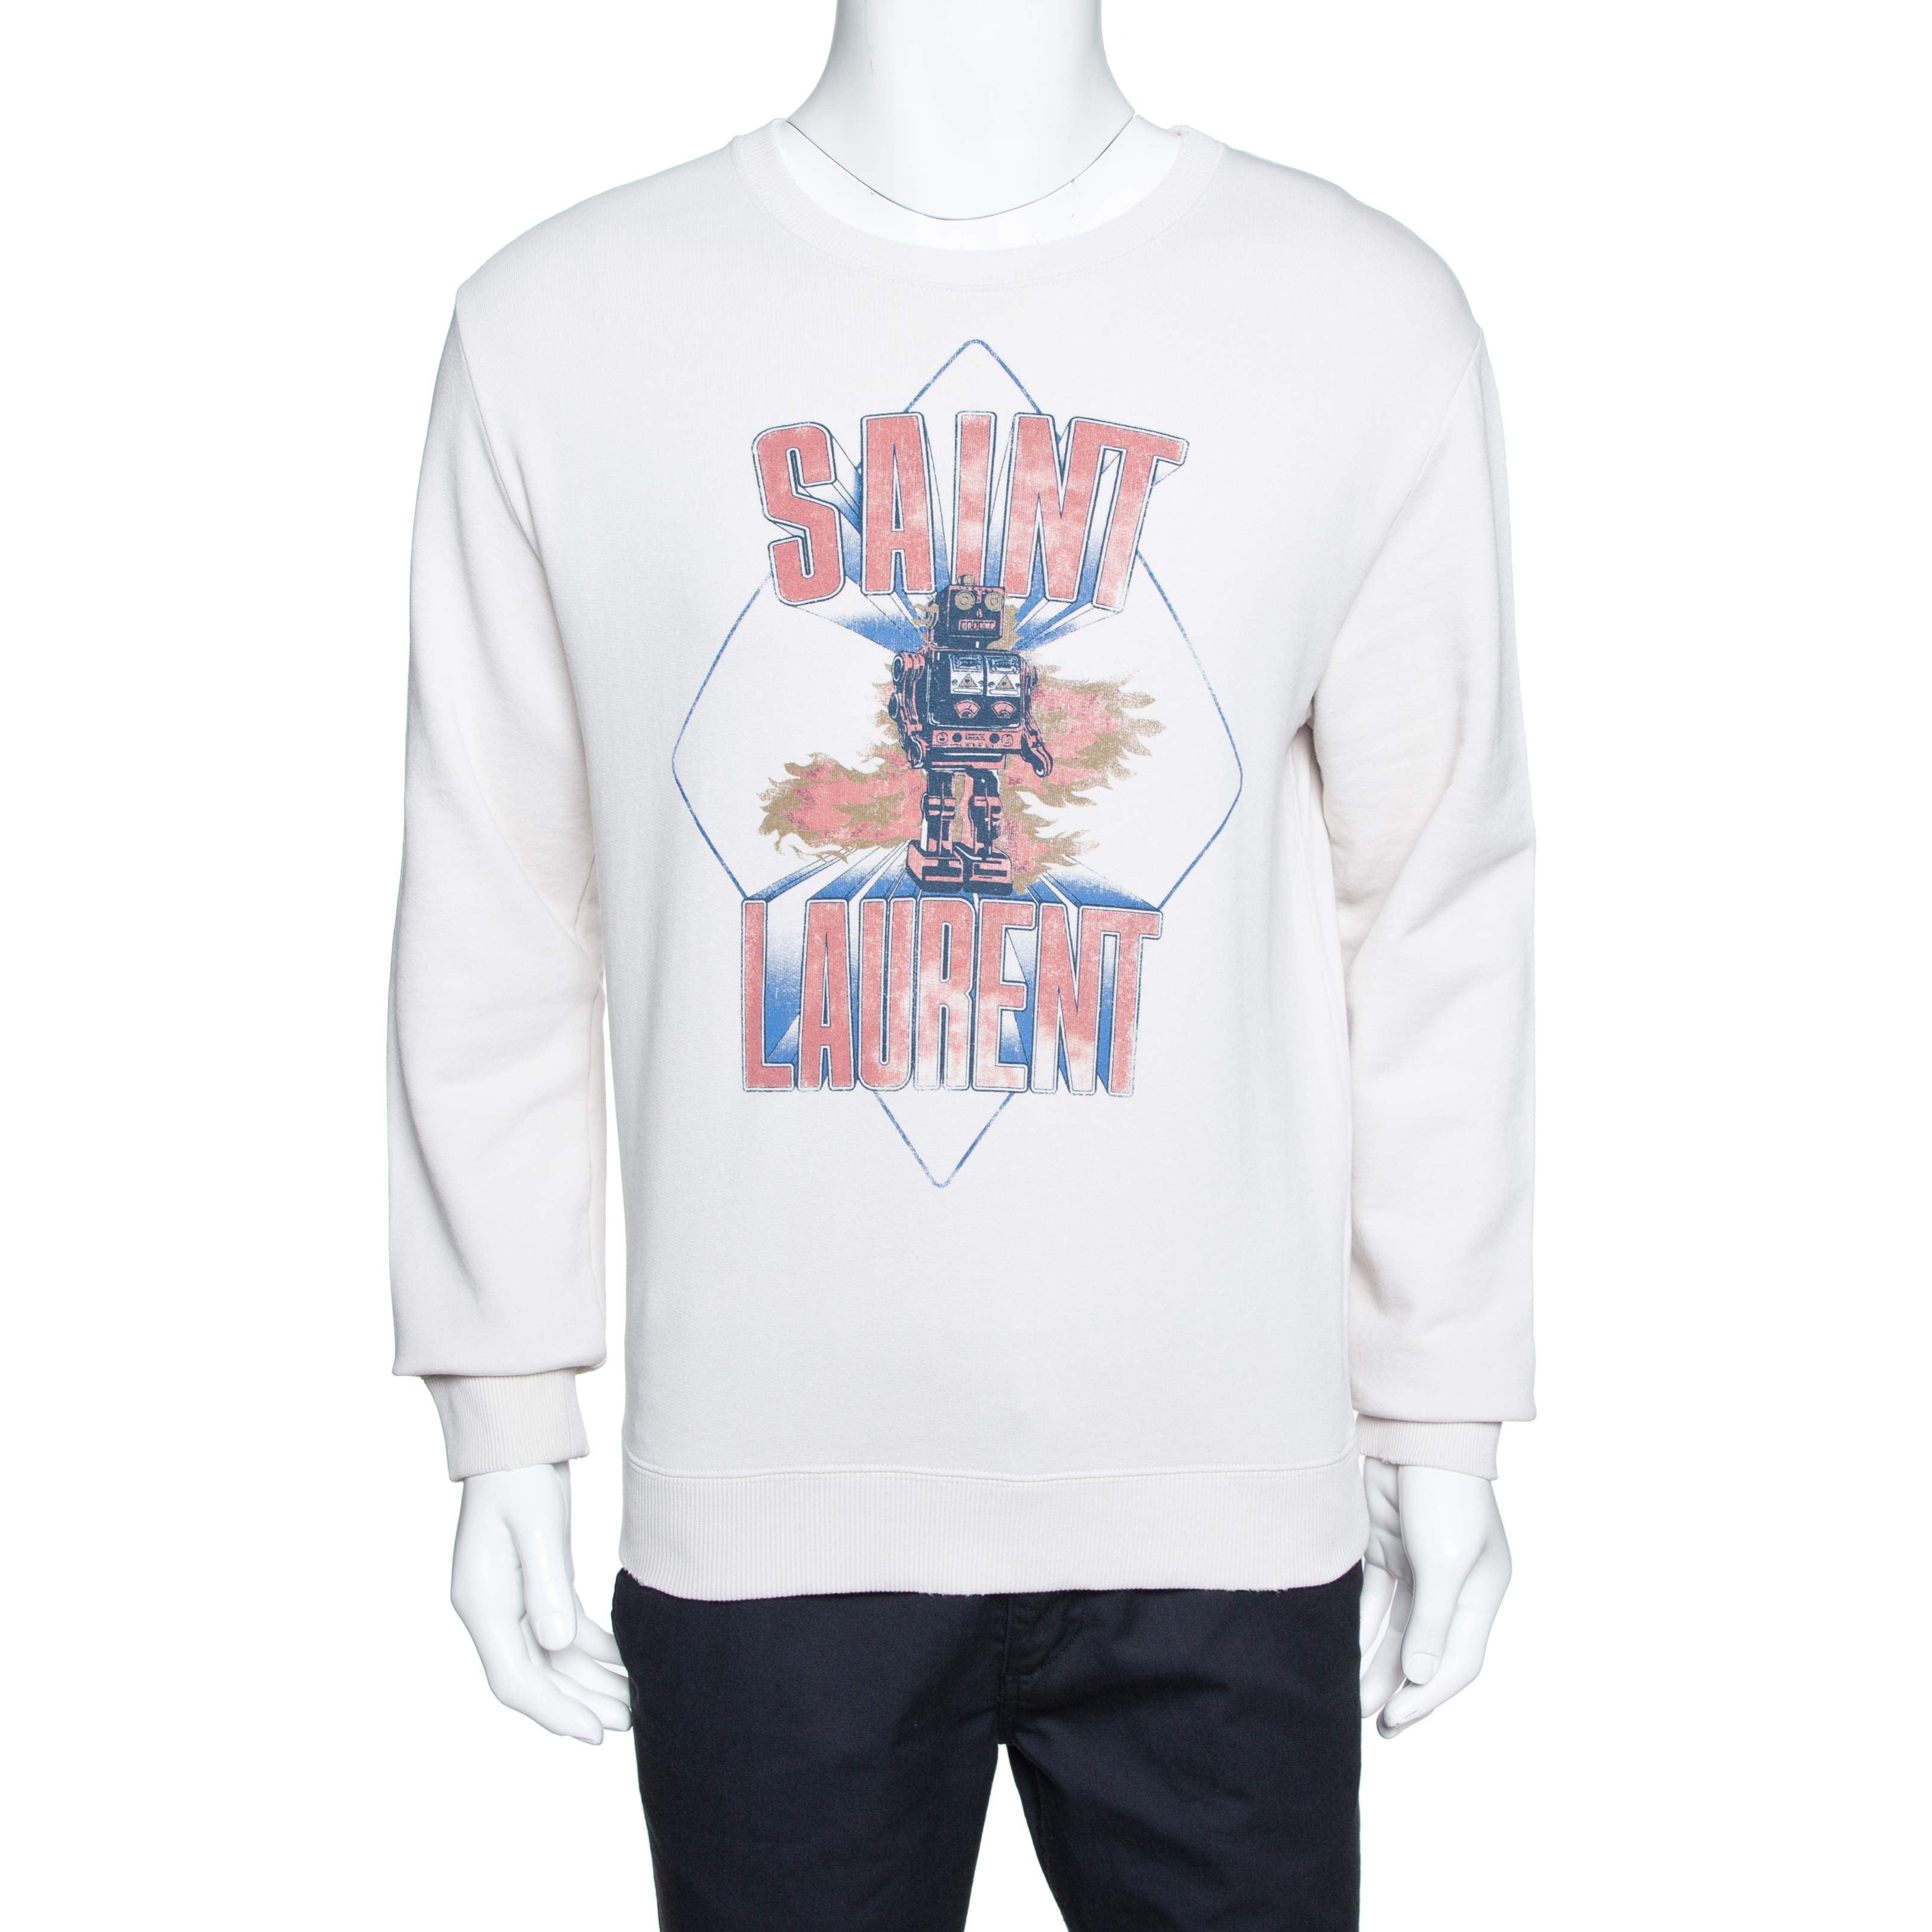 Saint Laurent Paris Ecru Robot Aged Print Distressed Sweatshirt S